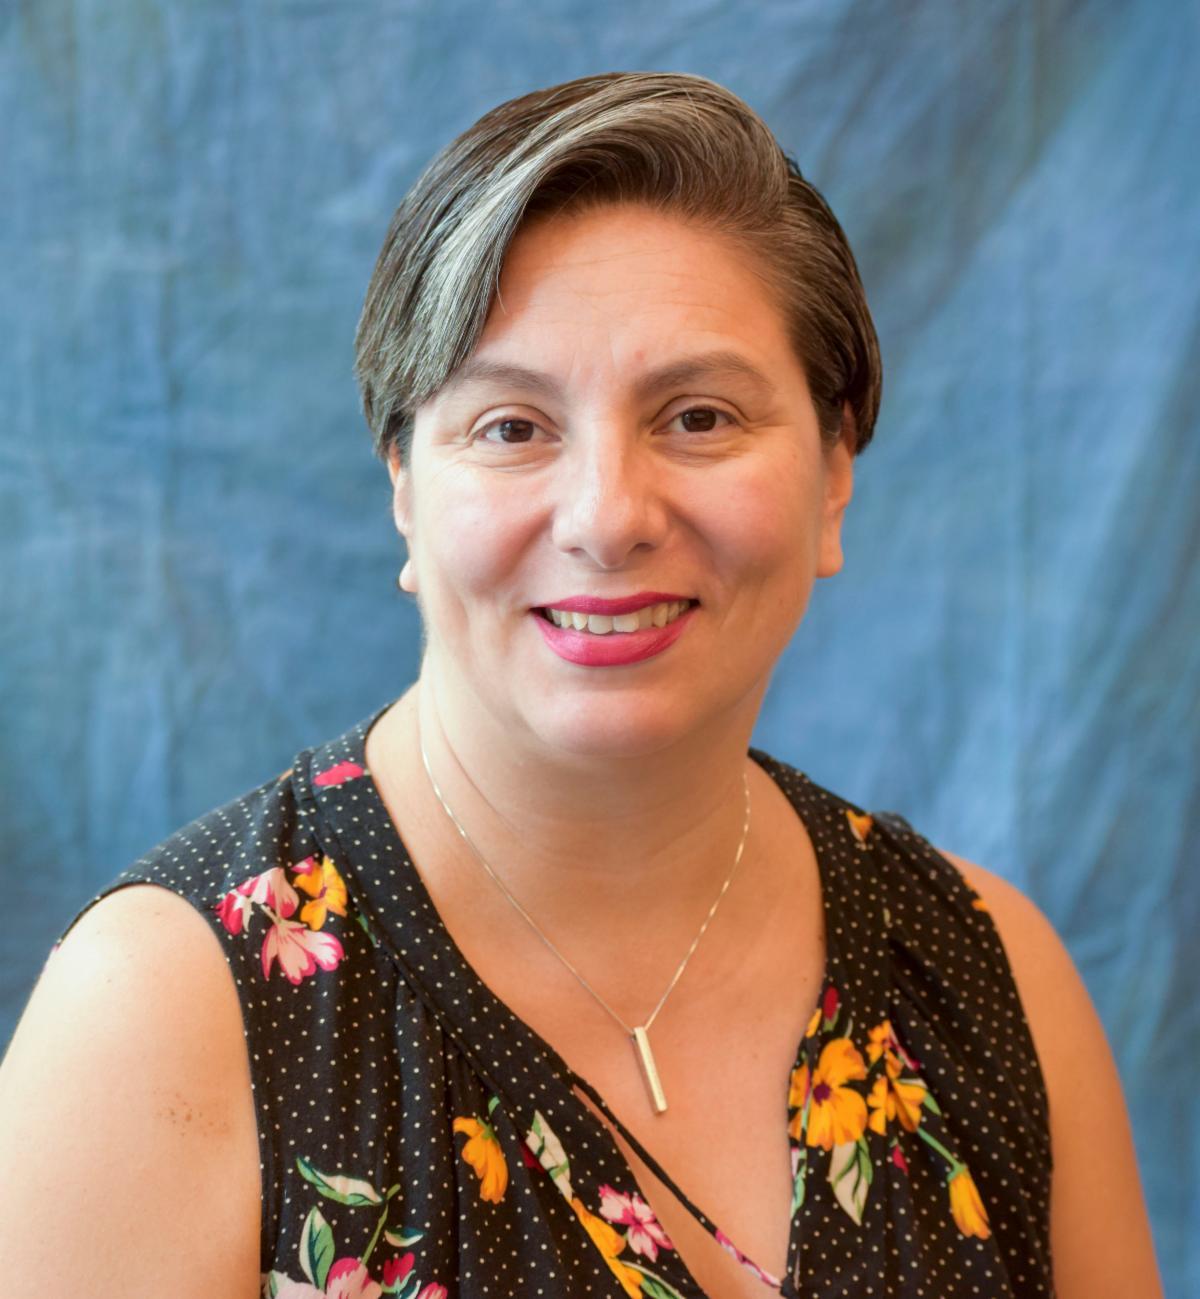 Patty Mendez